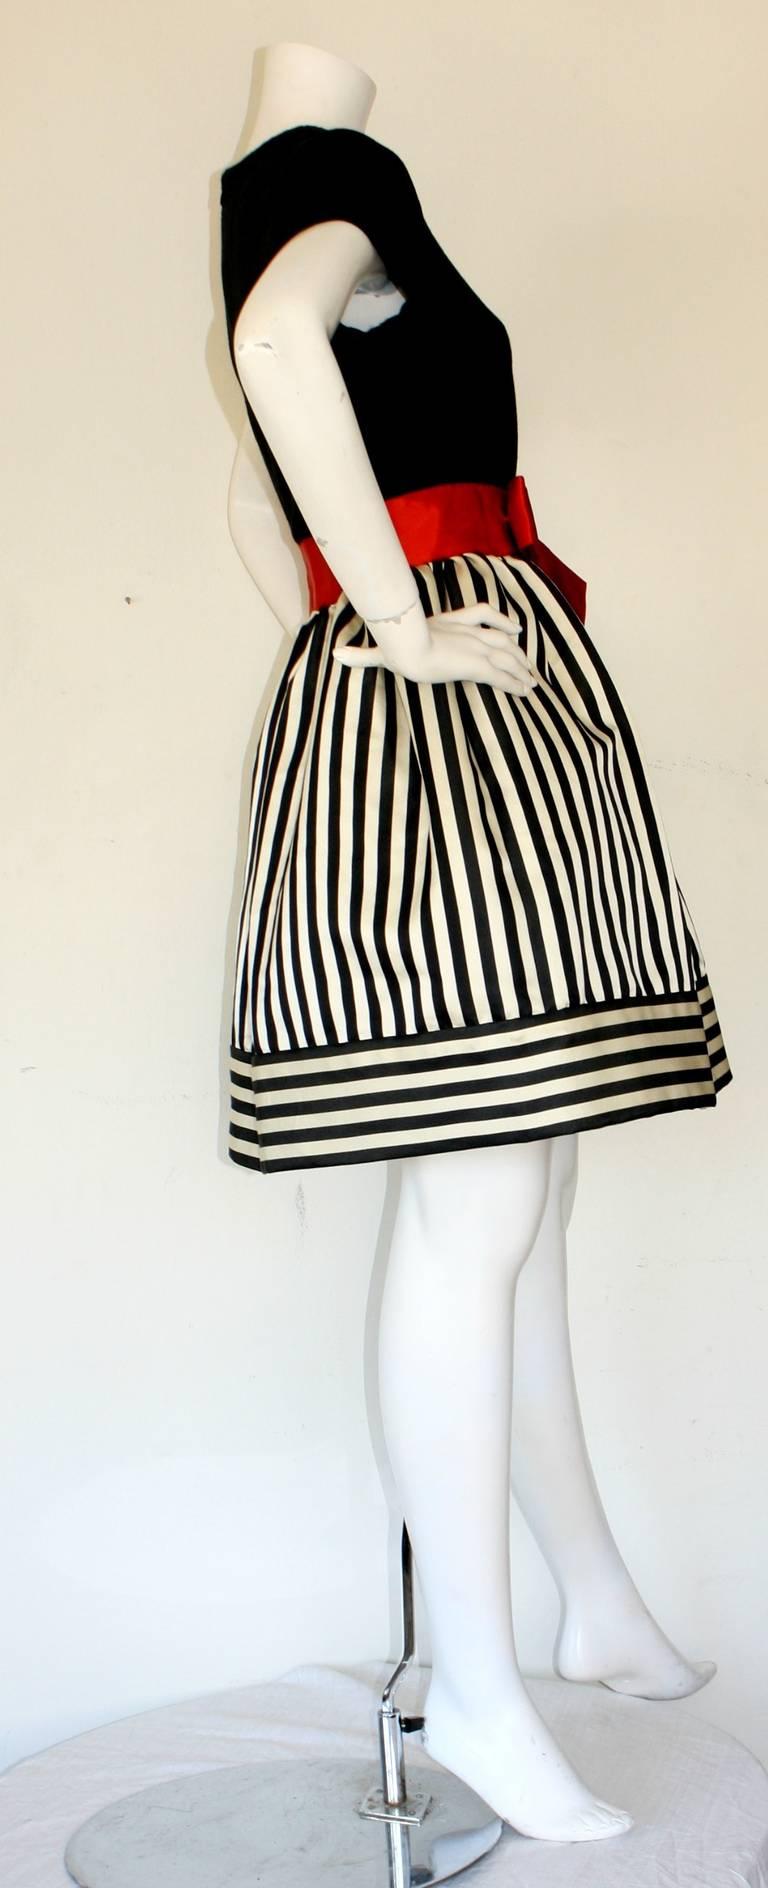 Bill Blass Vintage Black & White Stripe Dress w/ Red Bow Belt For Sale 2